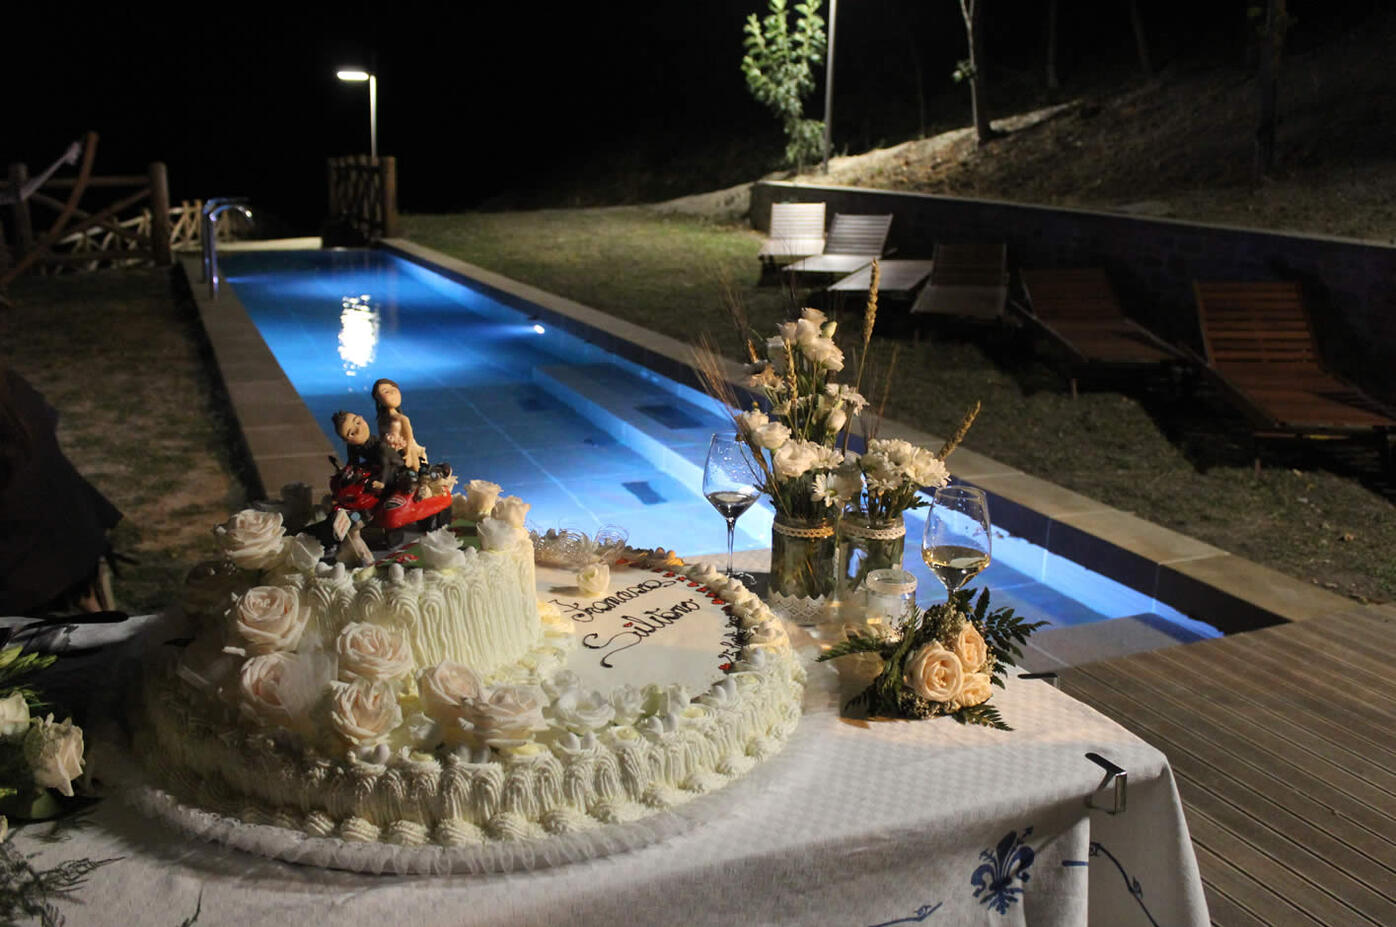 Matrimoni bagno di romagna agriturismo per cerimonie e ricevimenti forl cesena agriturismo - Eventi bagno di romagna ...